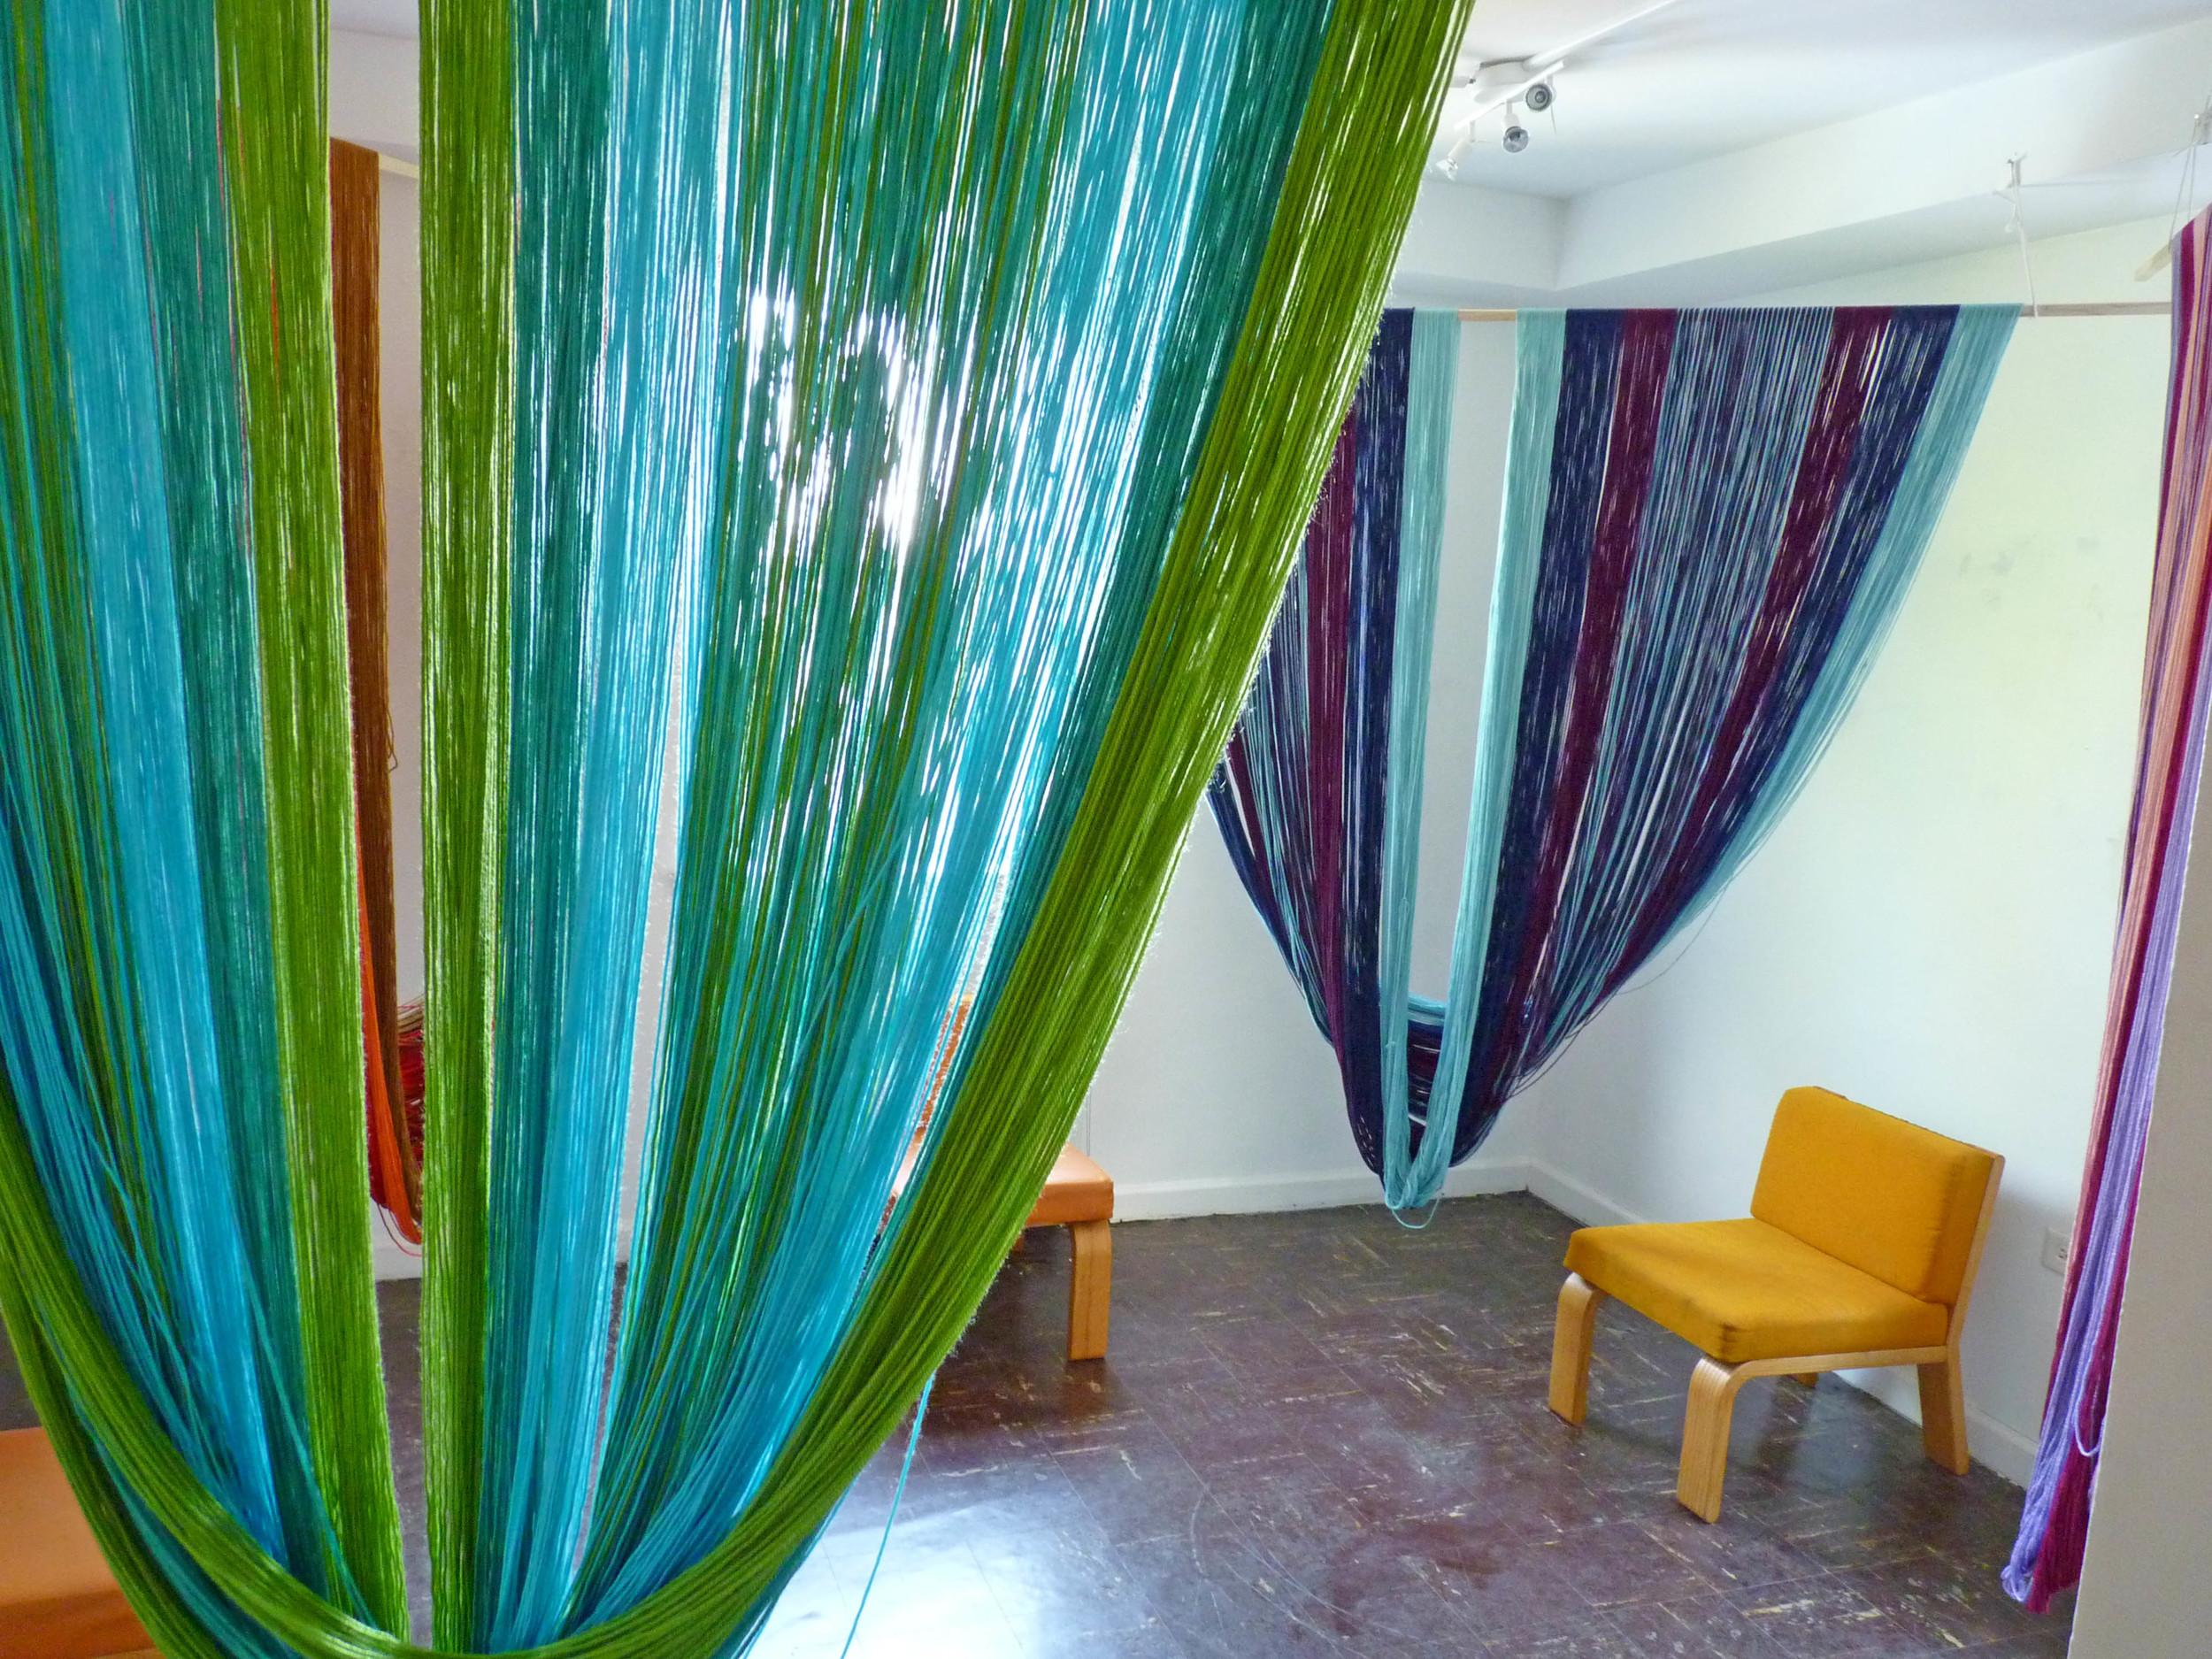 Corners for Seasons (Installation view), 2015, Acrylic yarn, wood, Four units, each 7' x 6'